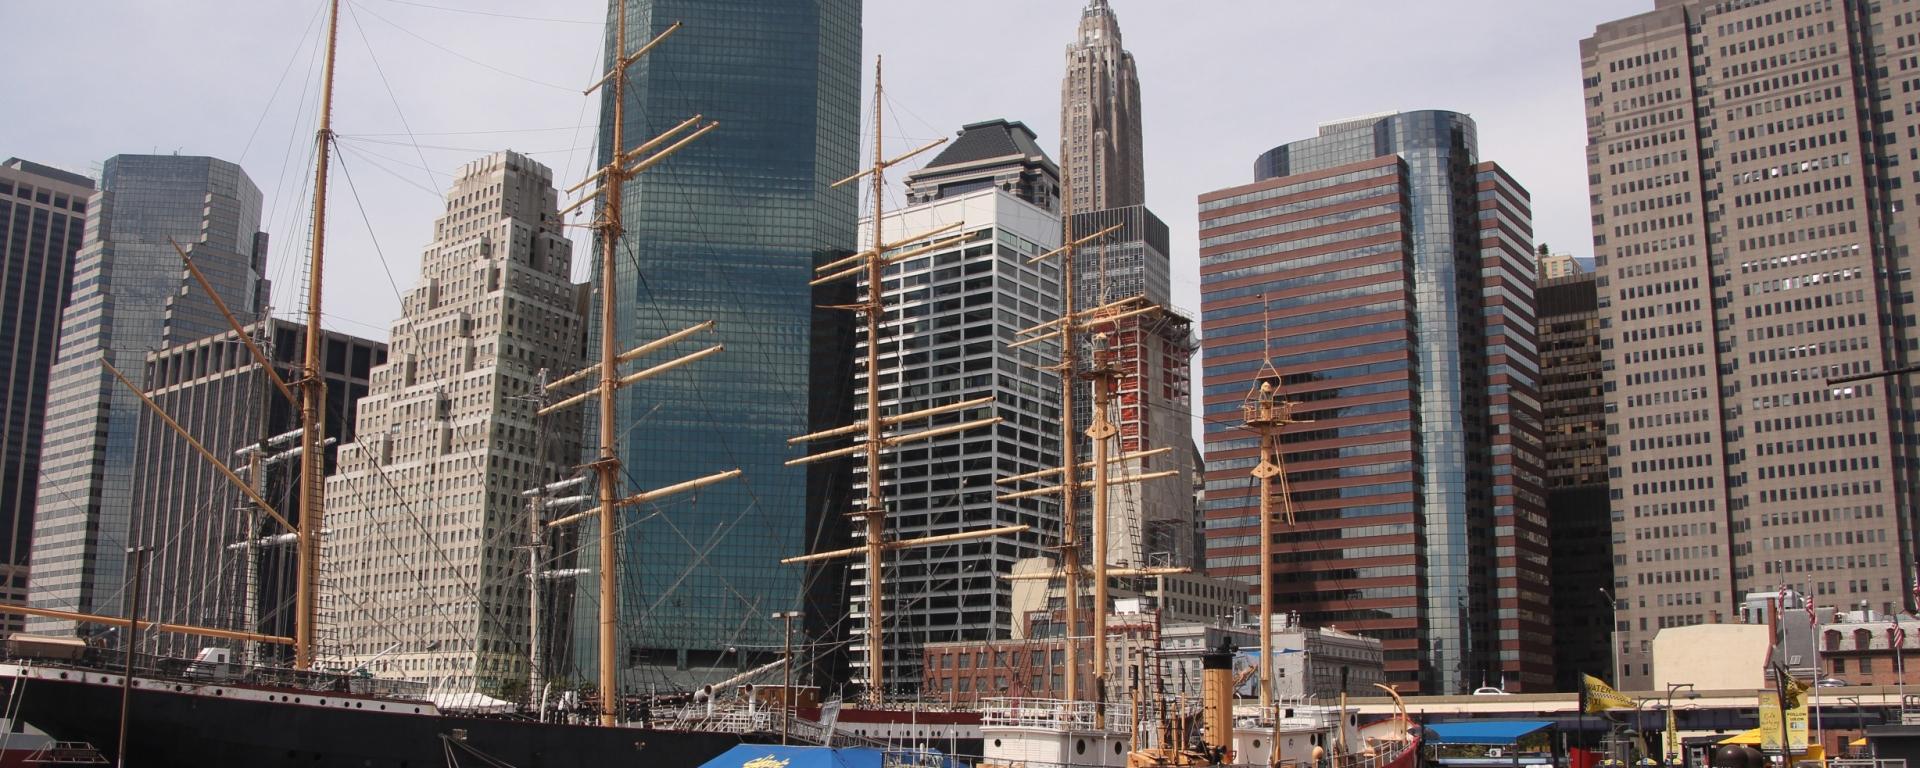 new york, new york city, photography, travel photography, travel, tourism